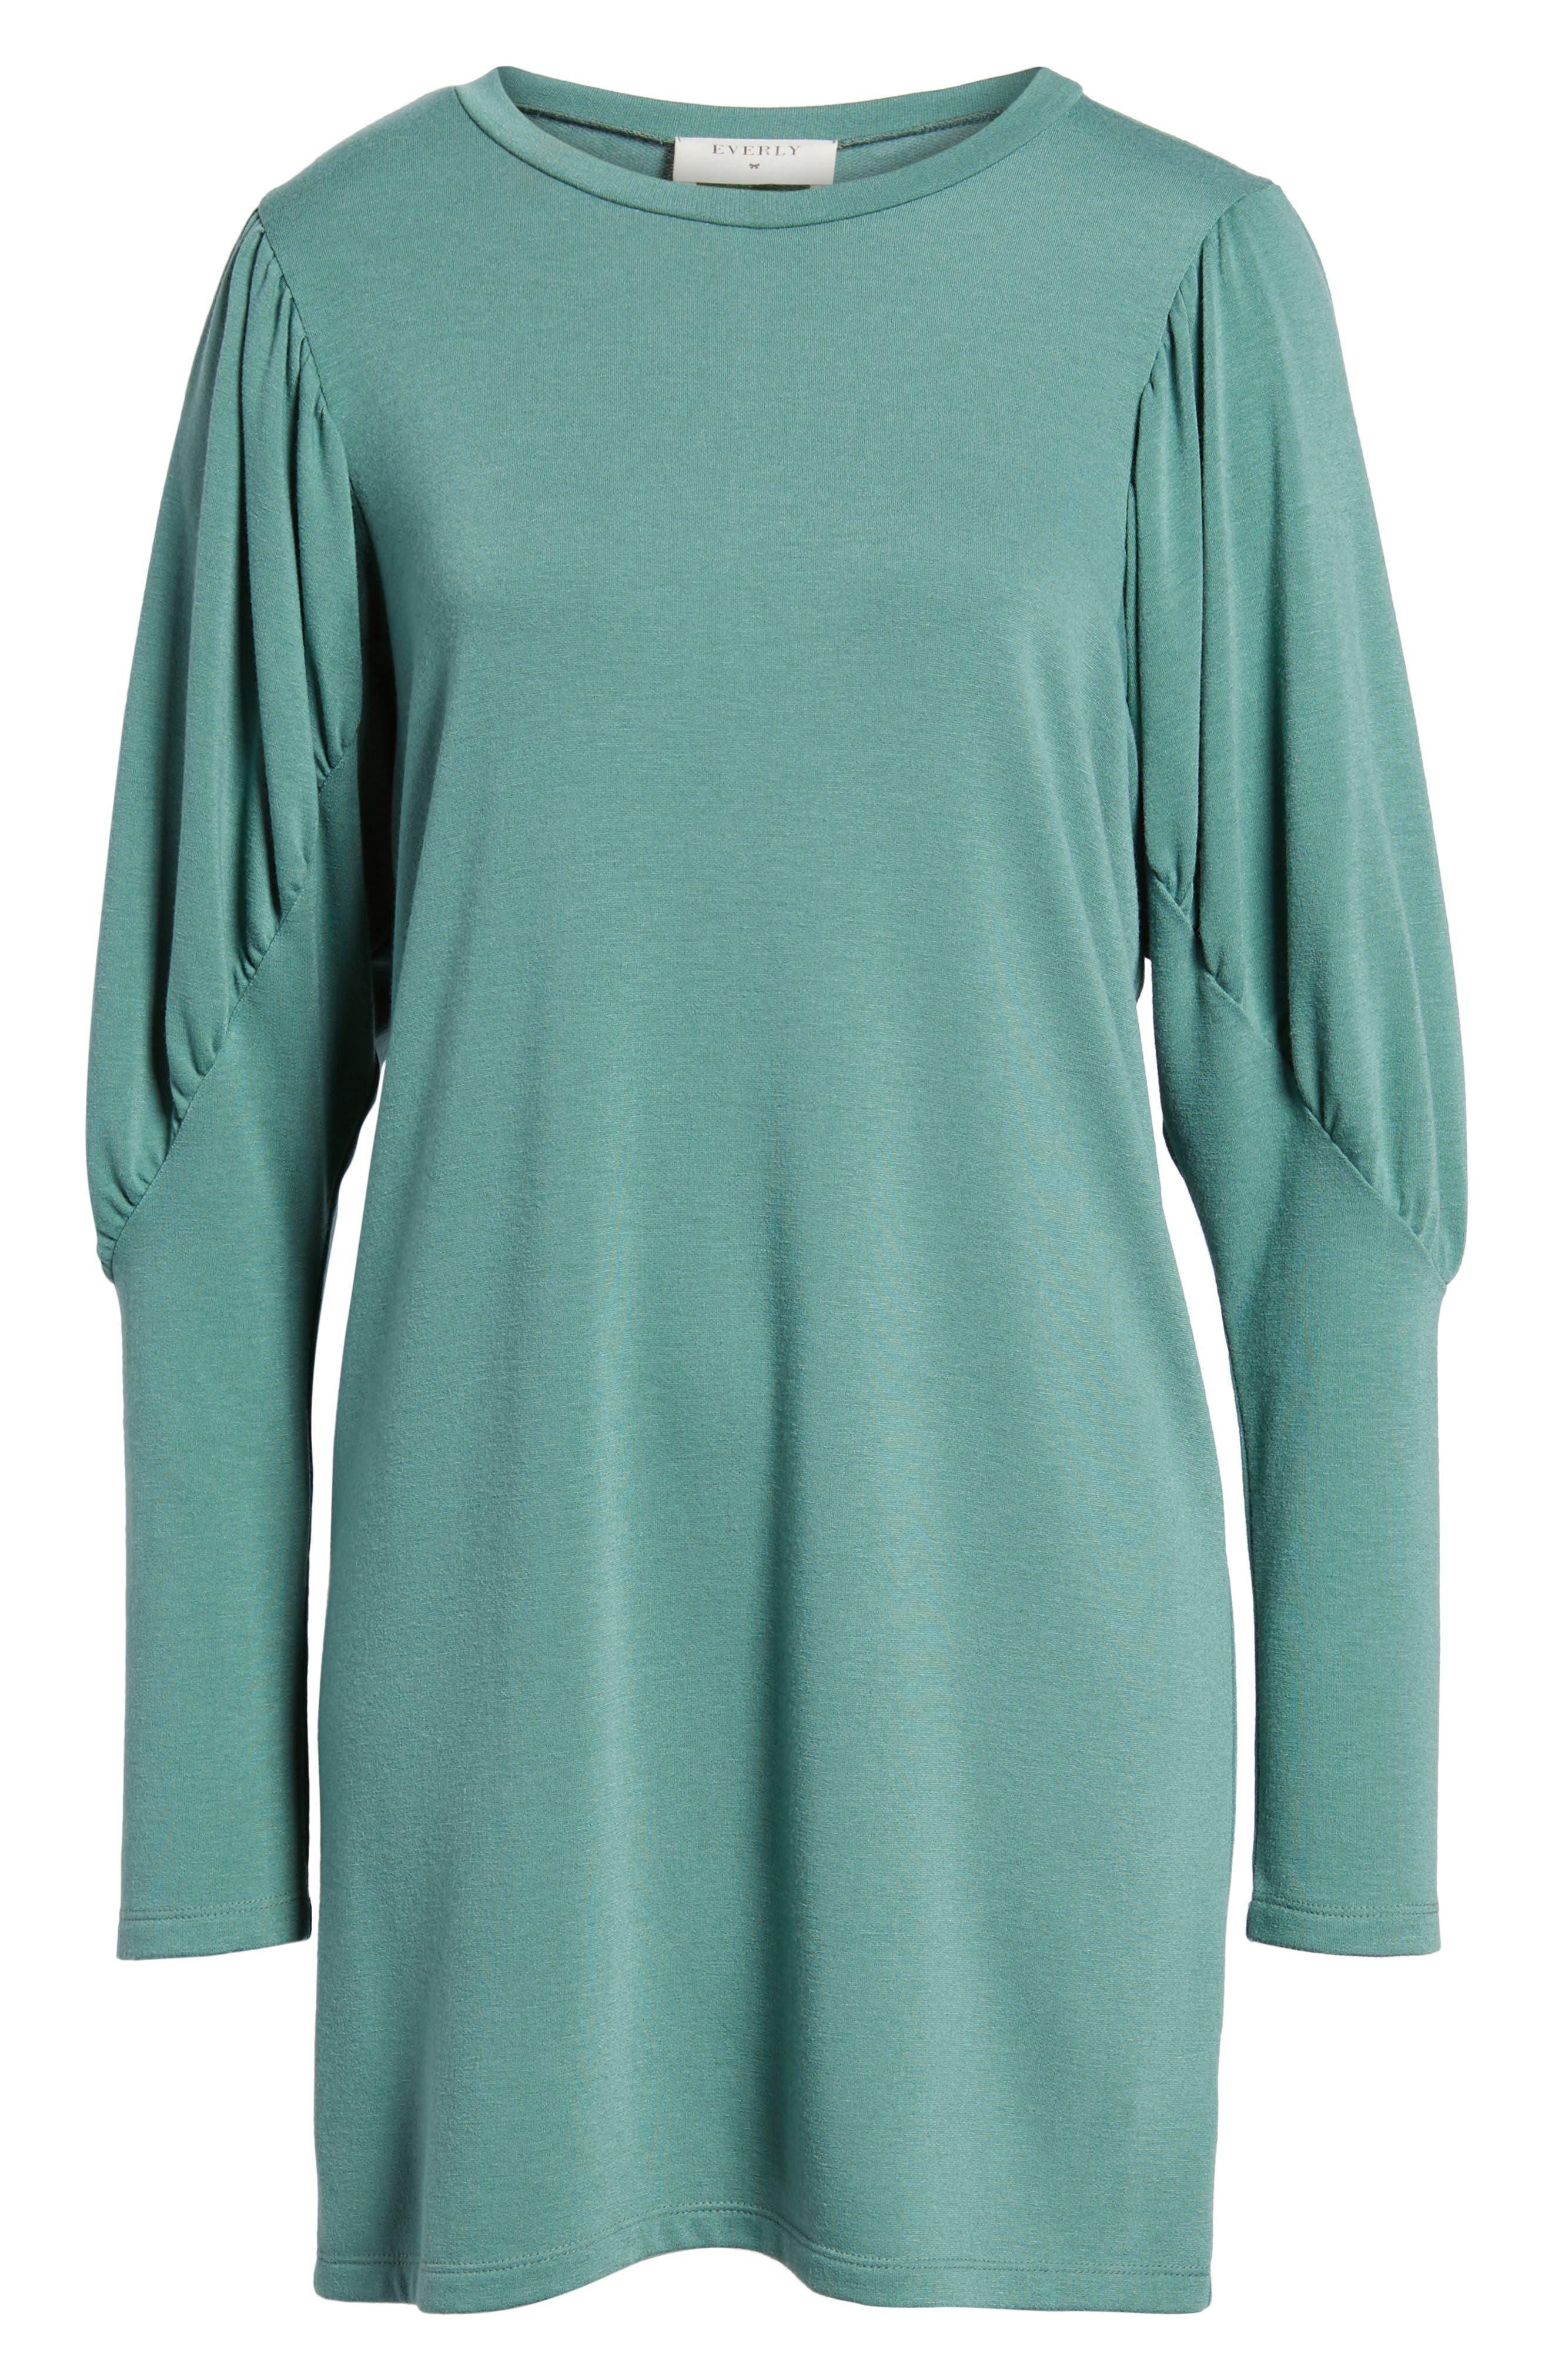 Everly Statement Sleeve Sweatshirt Dress